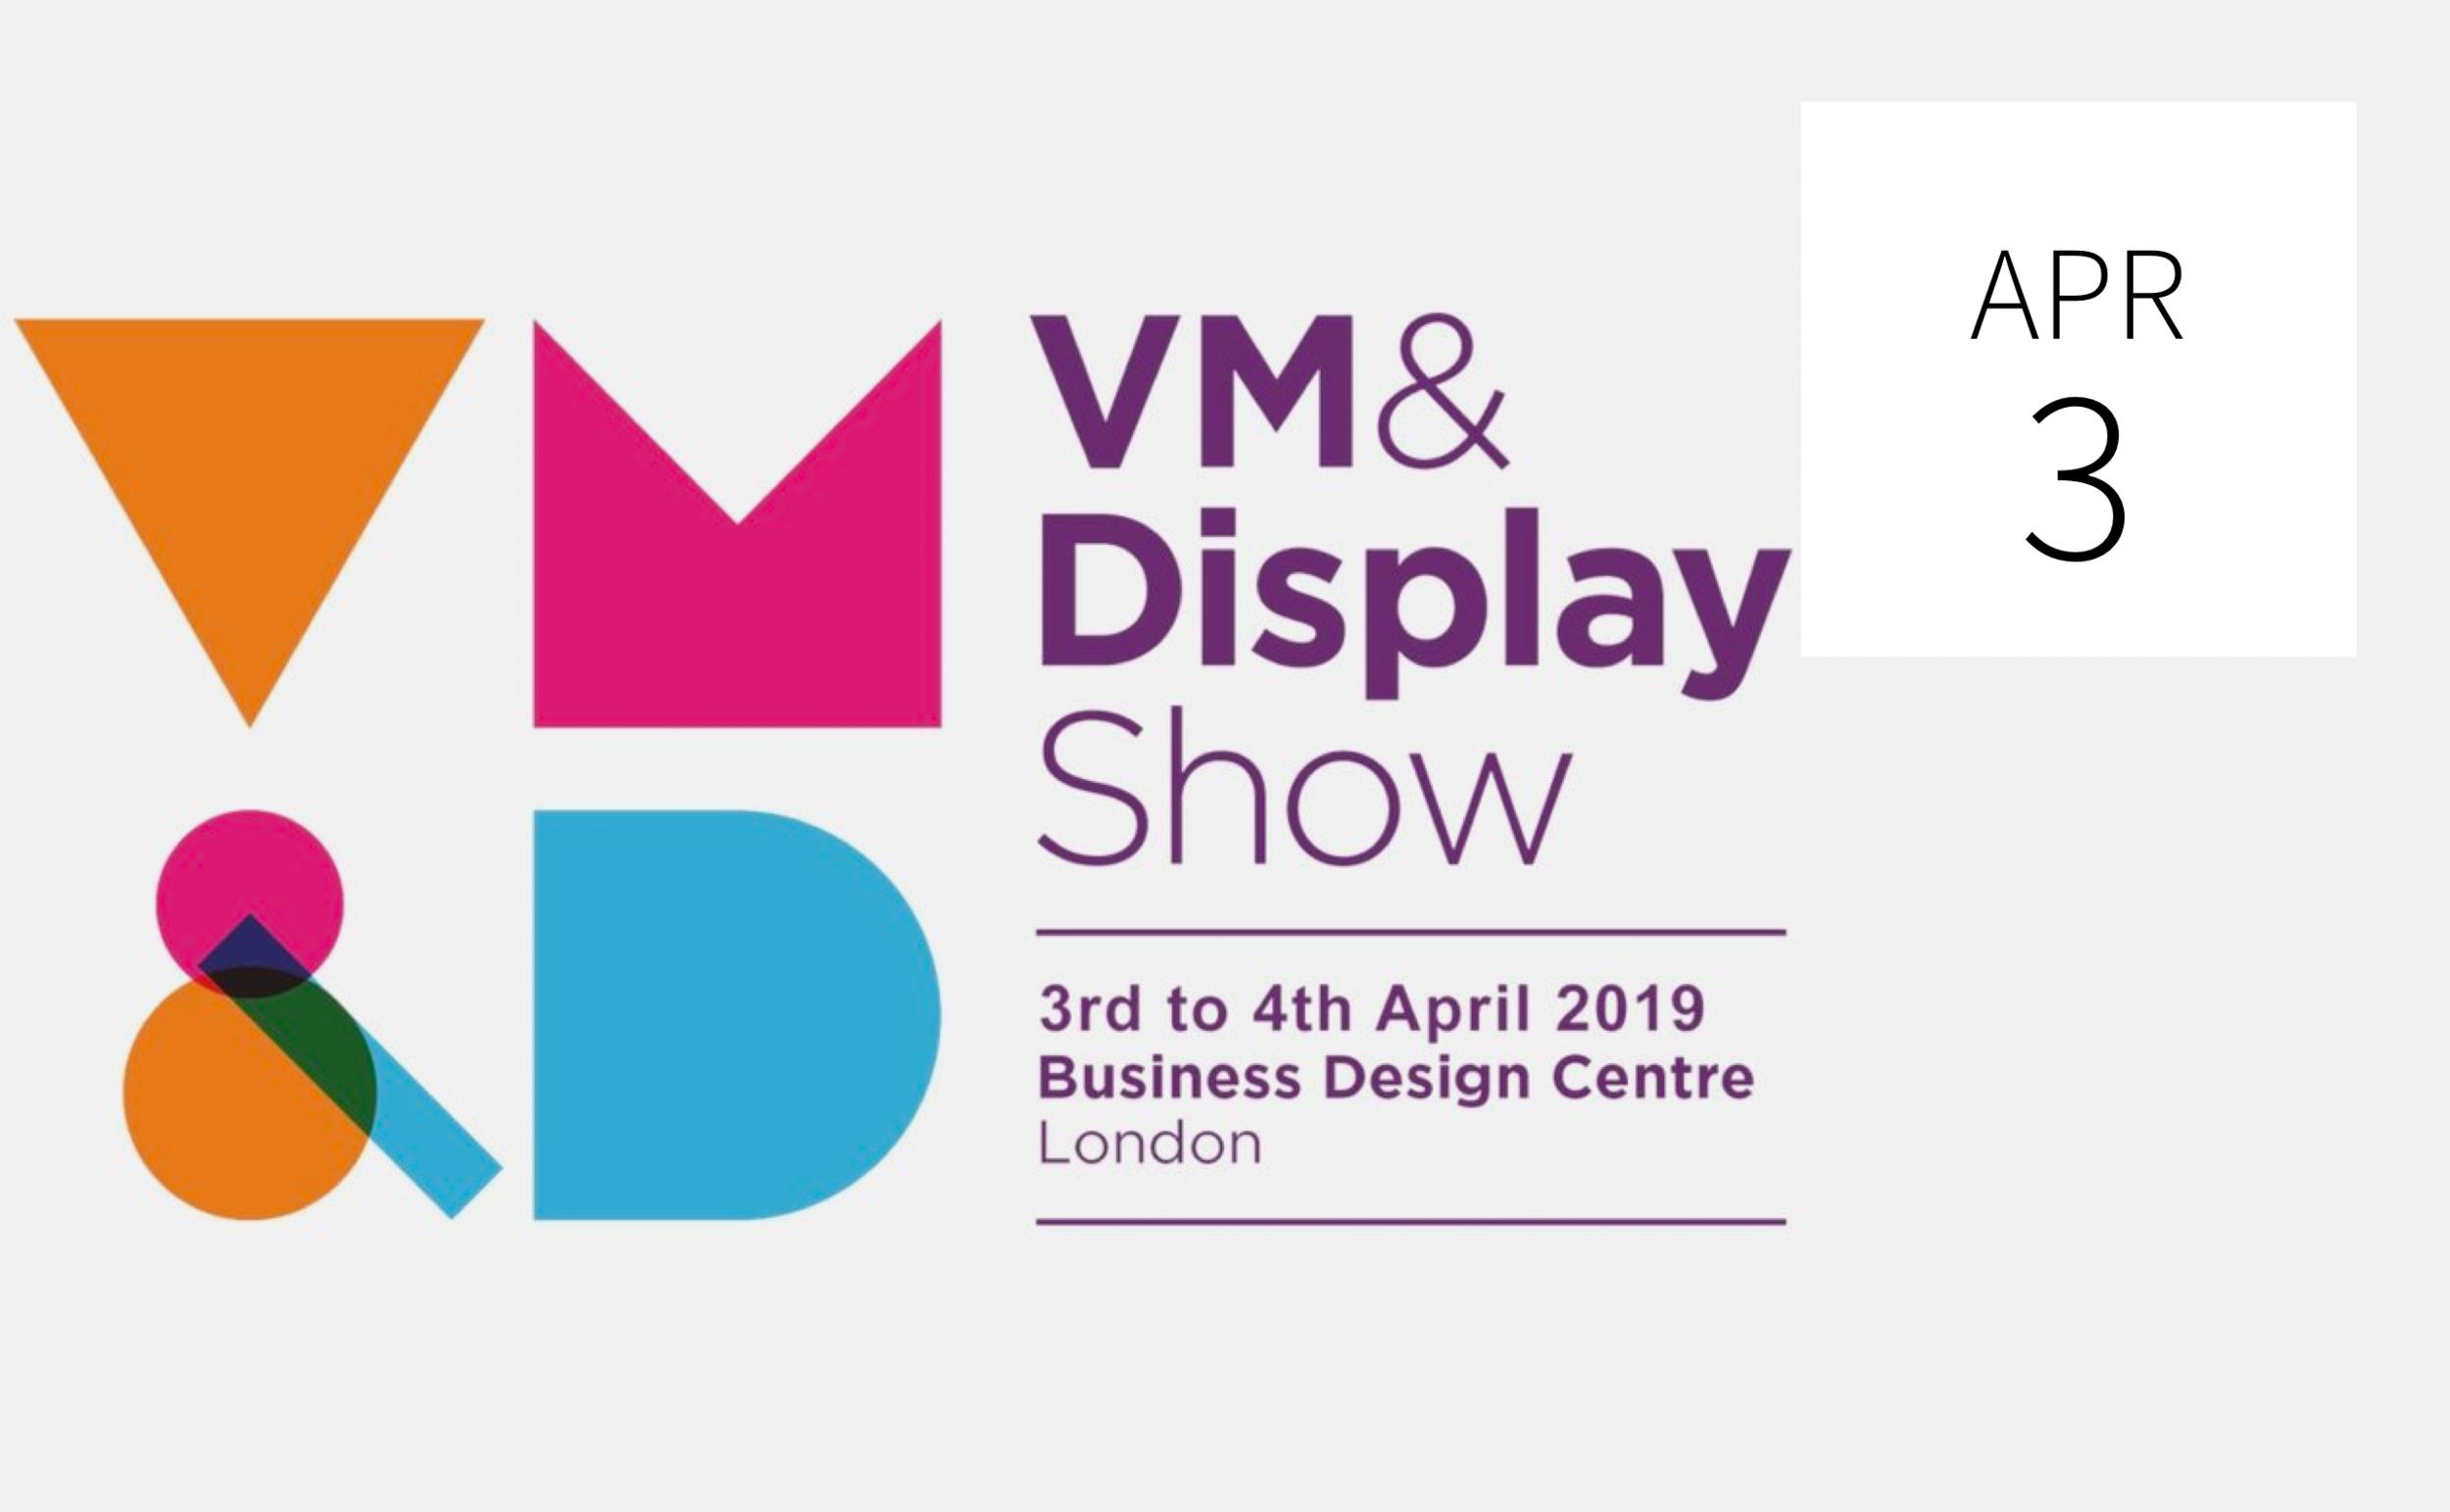 vm-display-show-2019.png